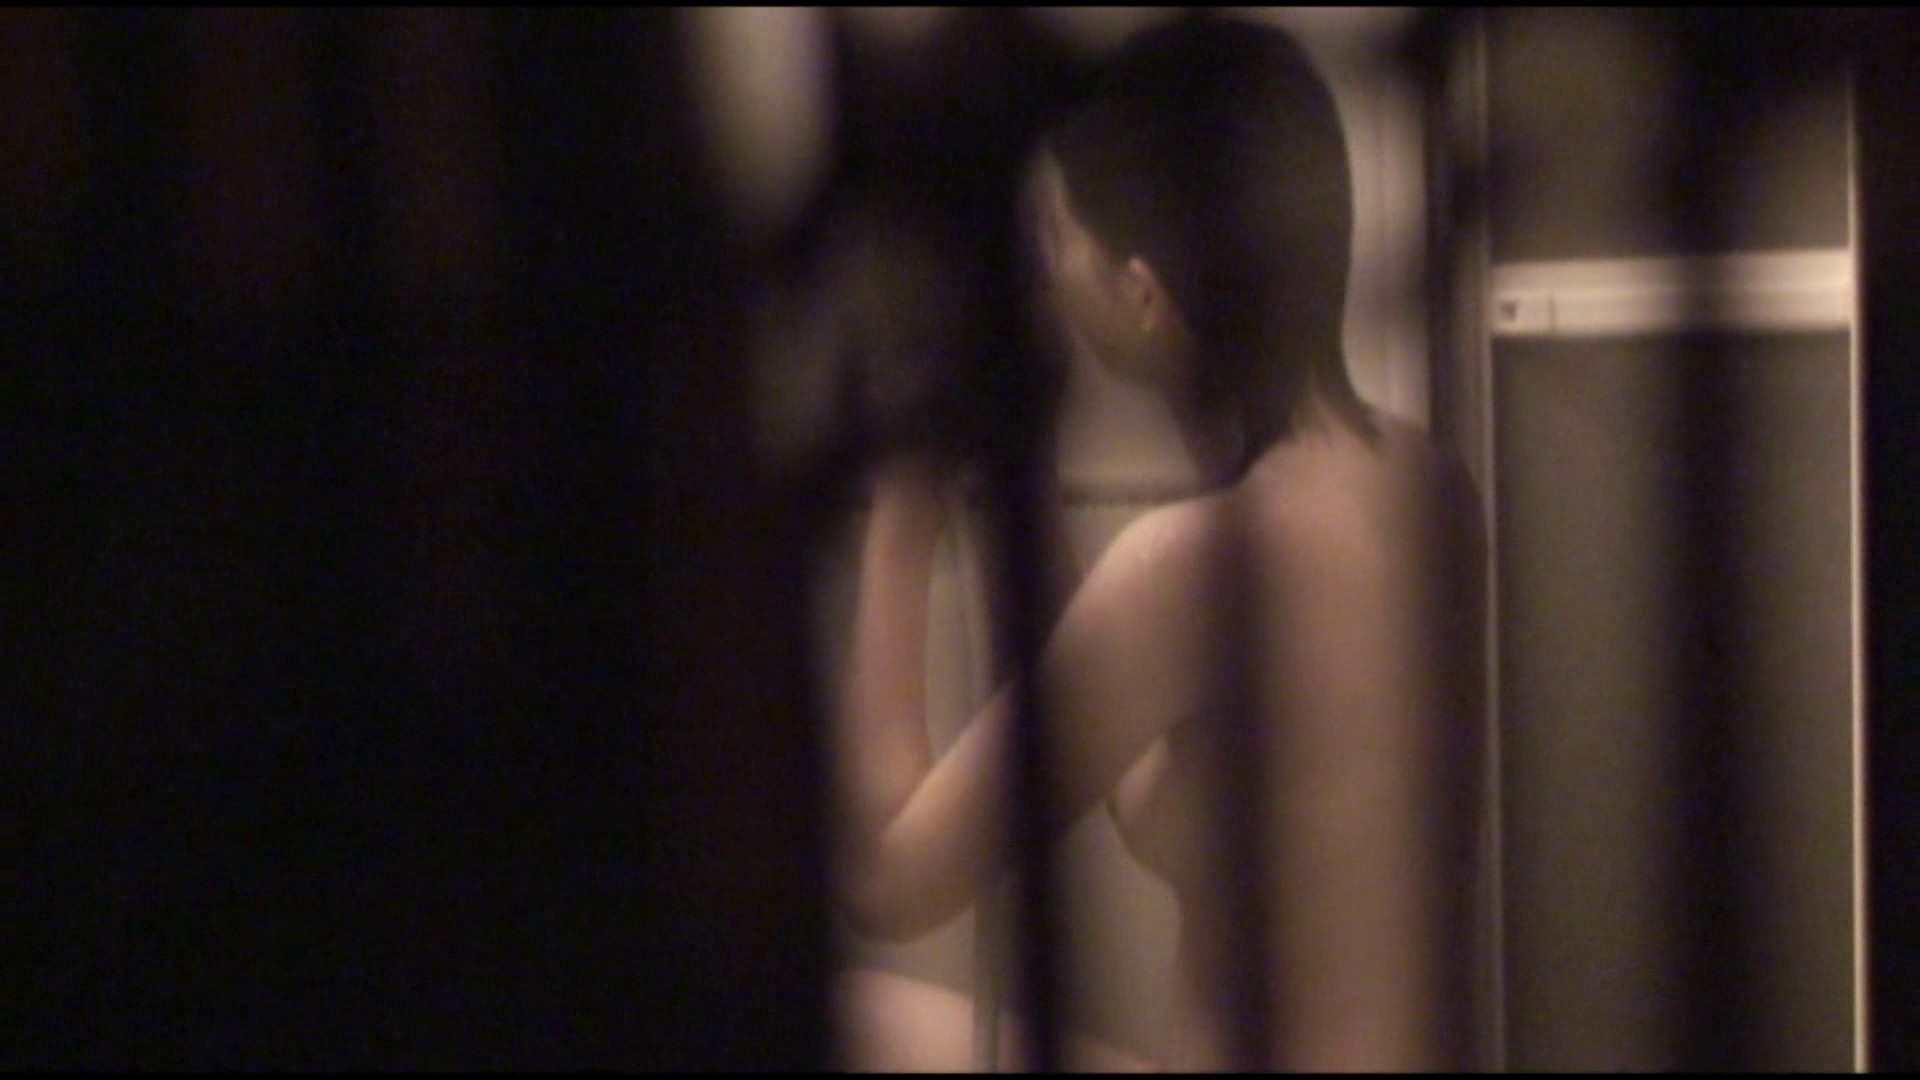 vol.05最高の極上美人!可愛い彼女の裸体をどうぞ!風呂上り鏡チェックも必見! 美人  99PIX 69